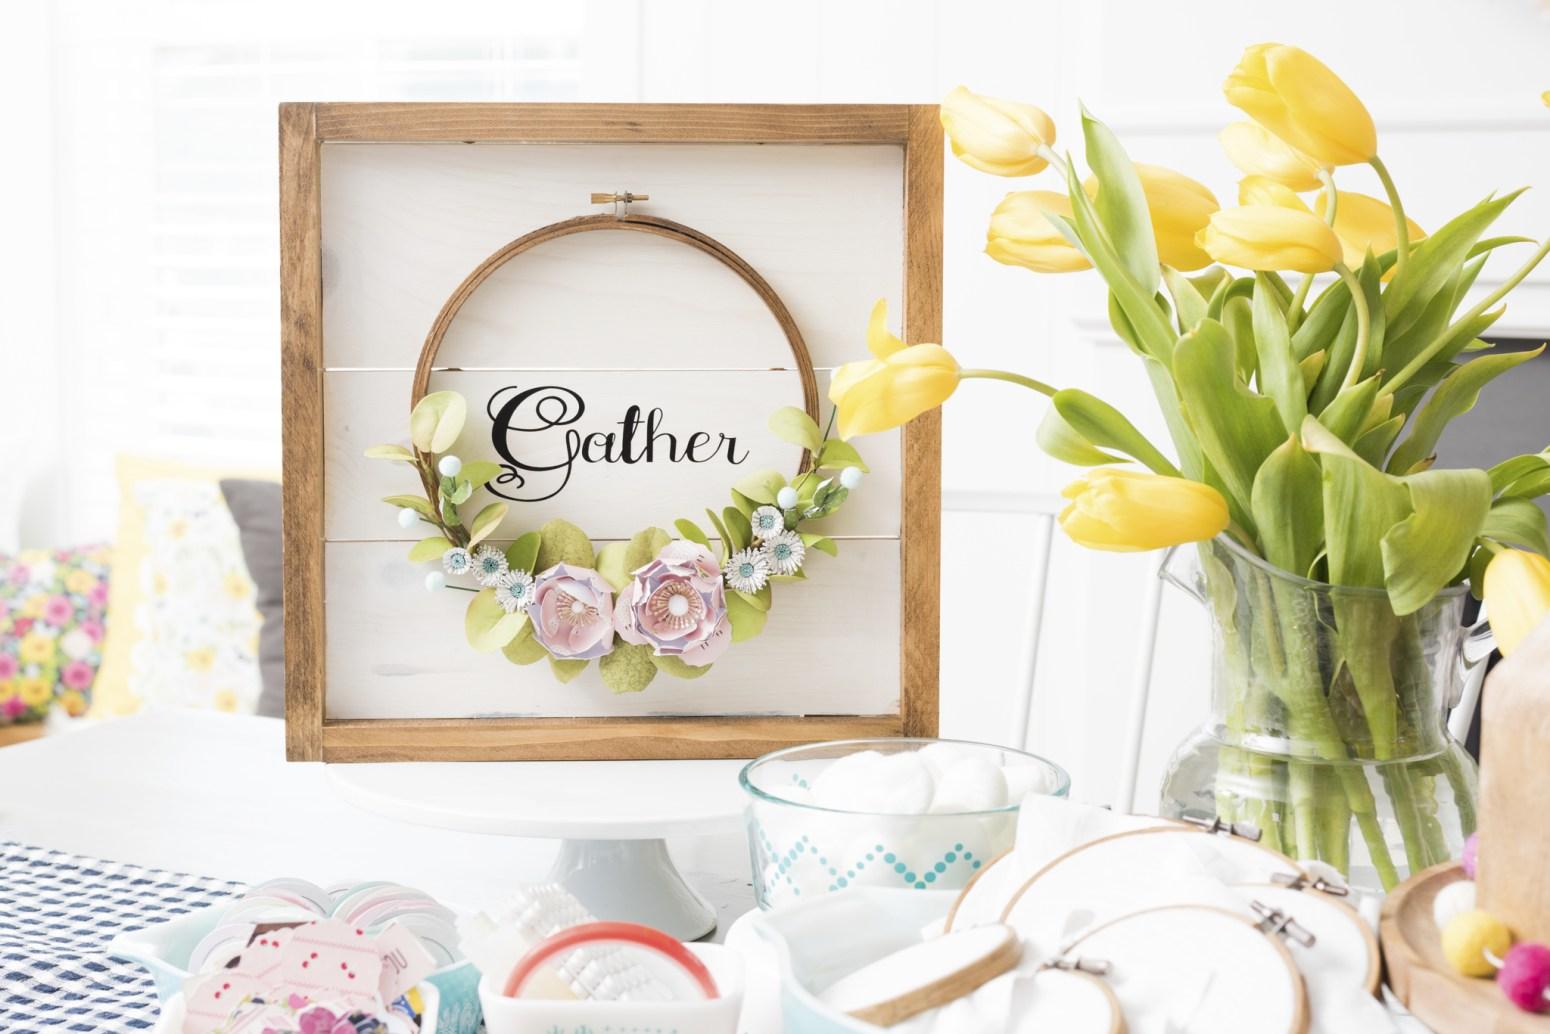 Gather flower art